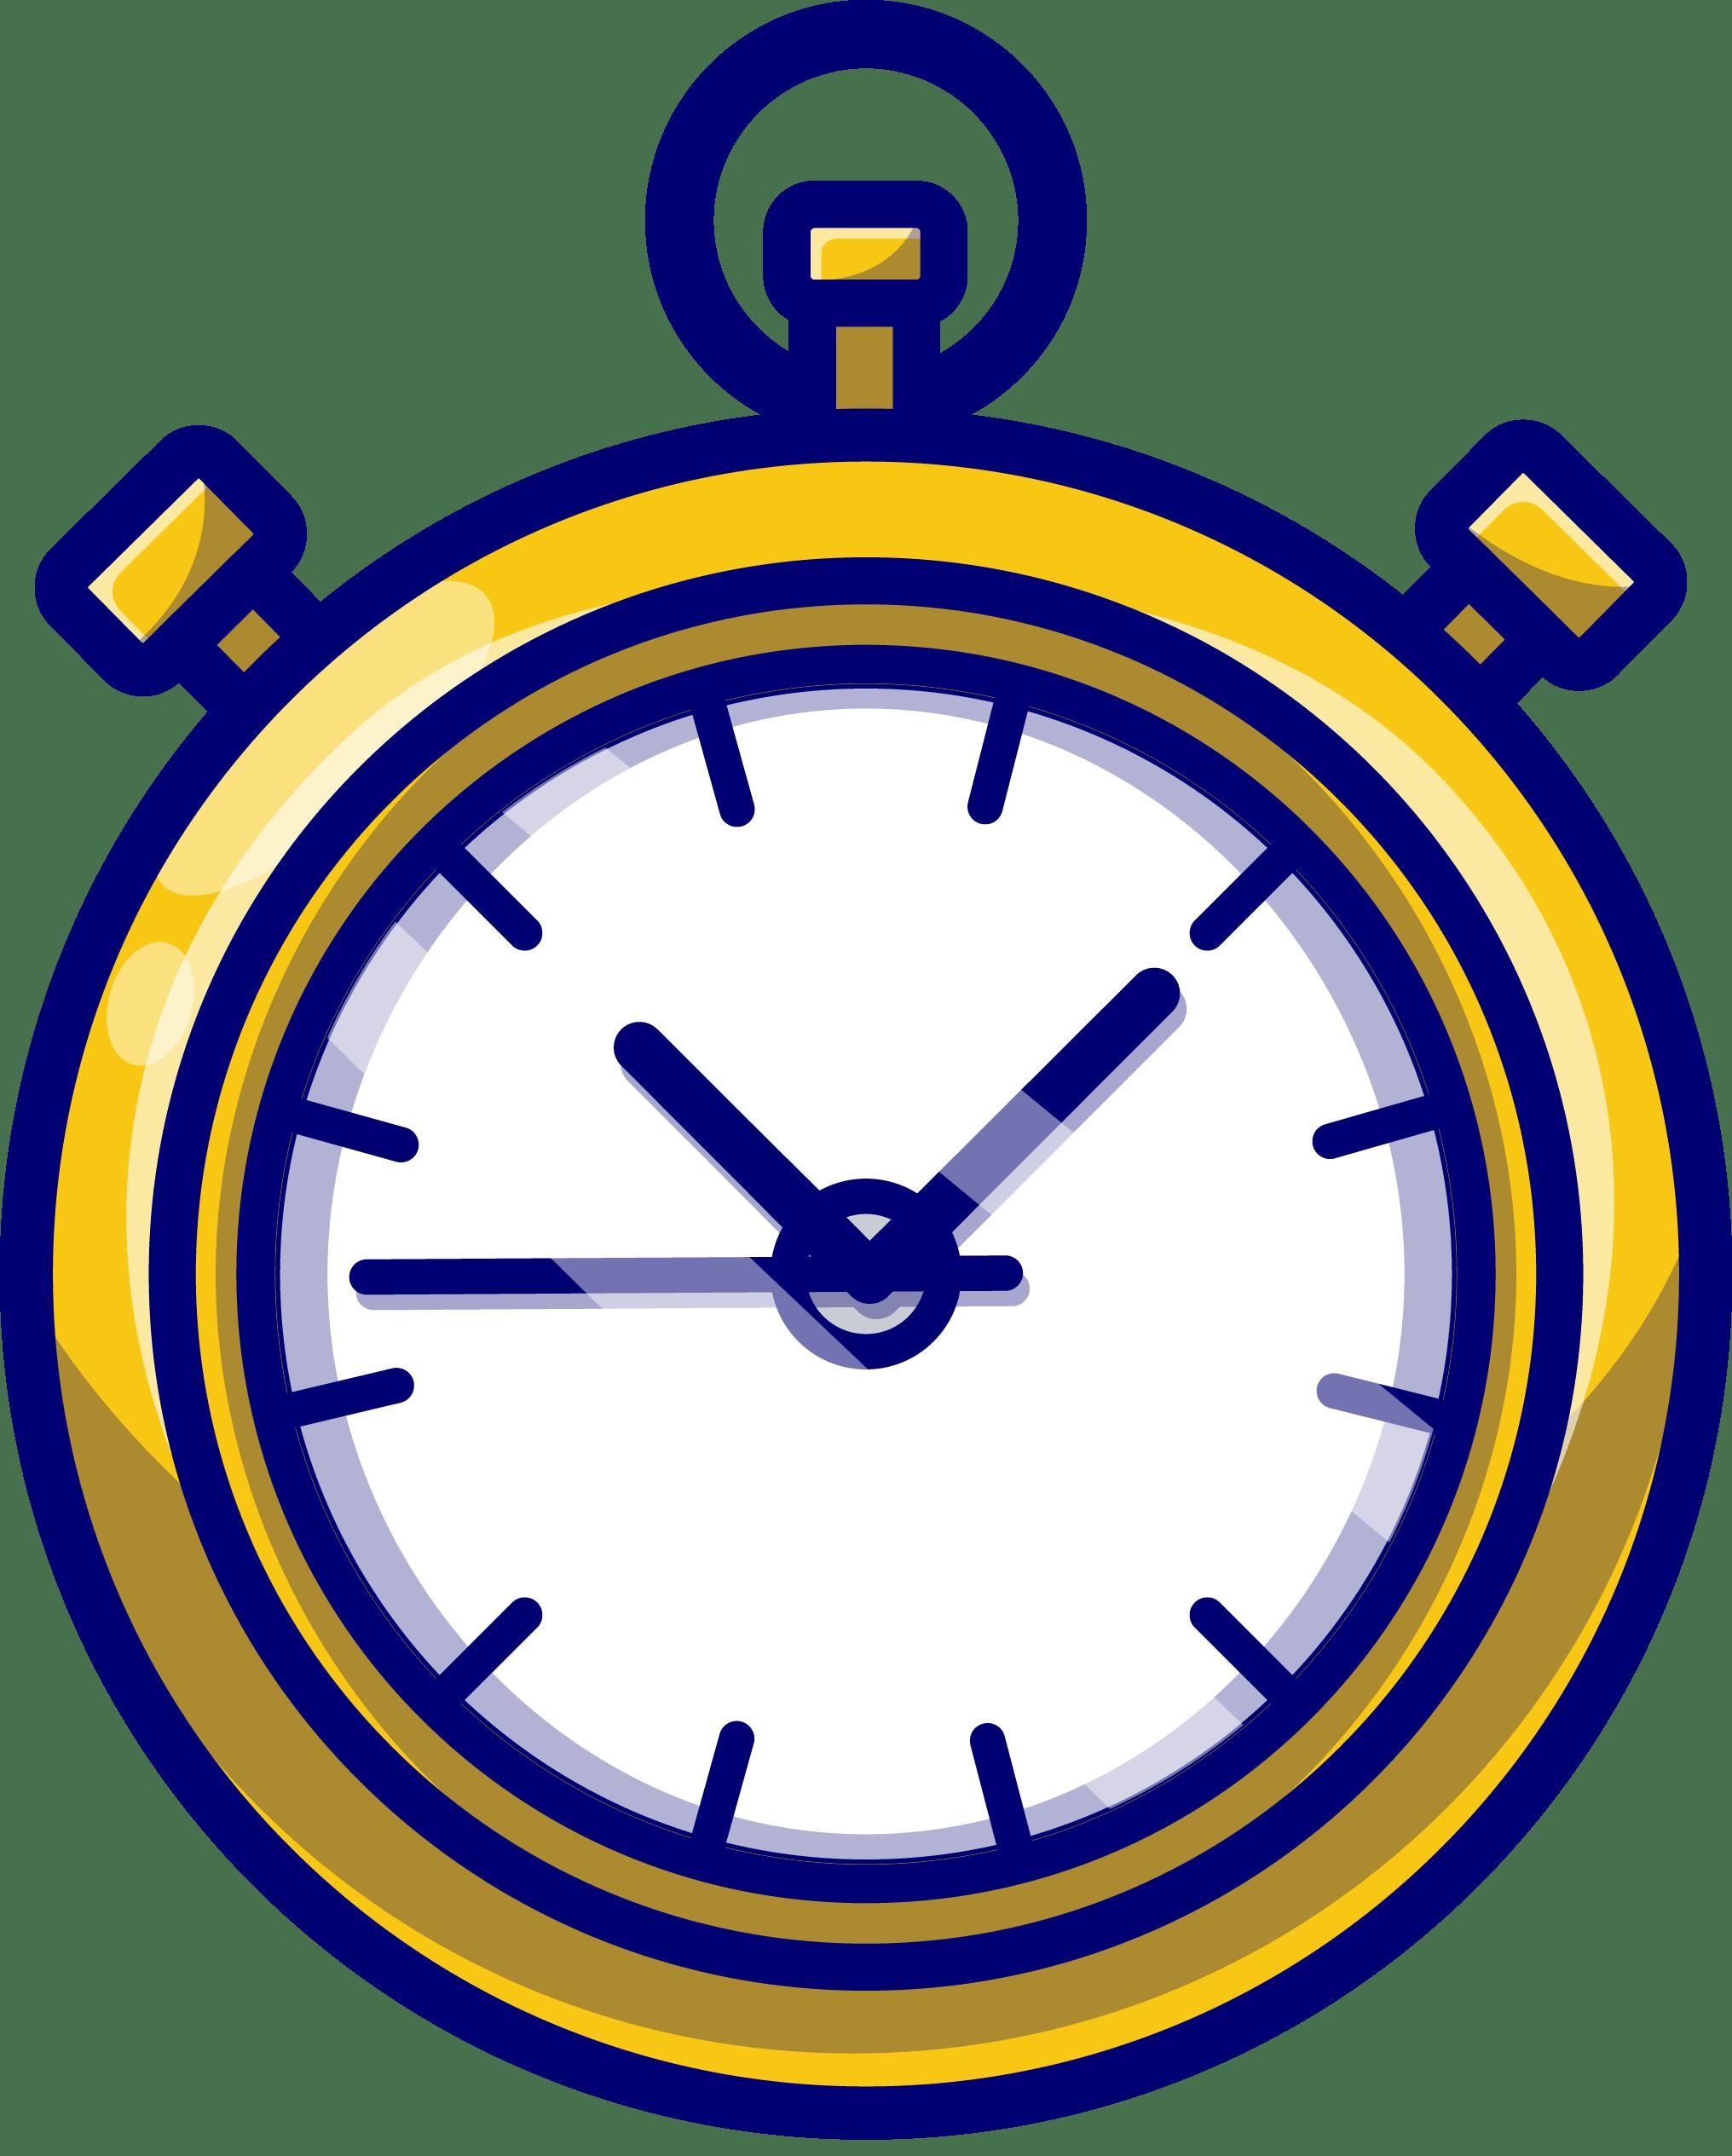 Digital marketing - Cronometro